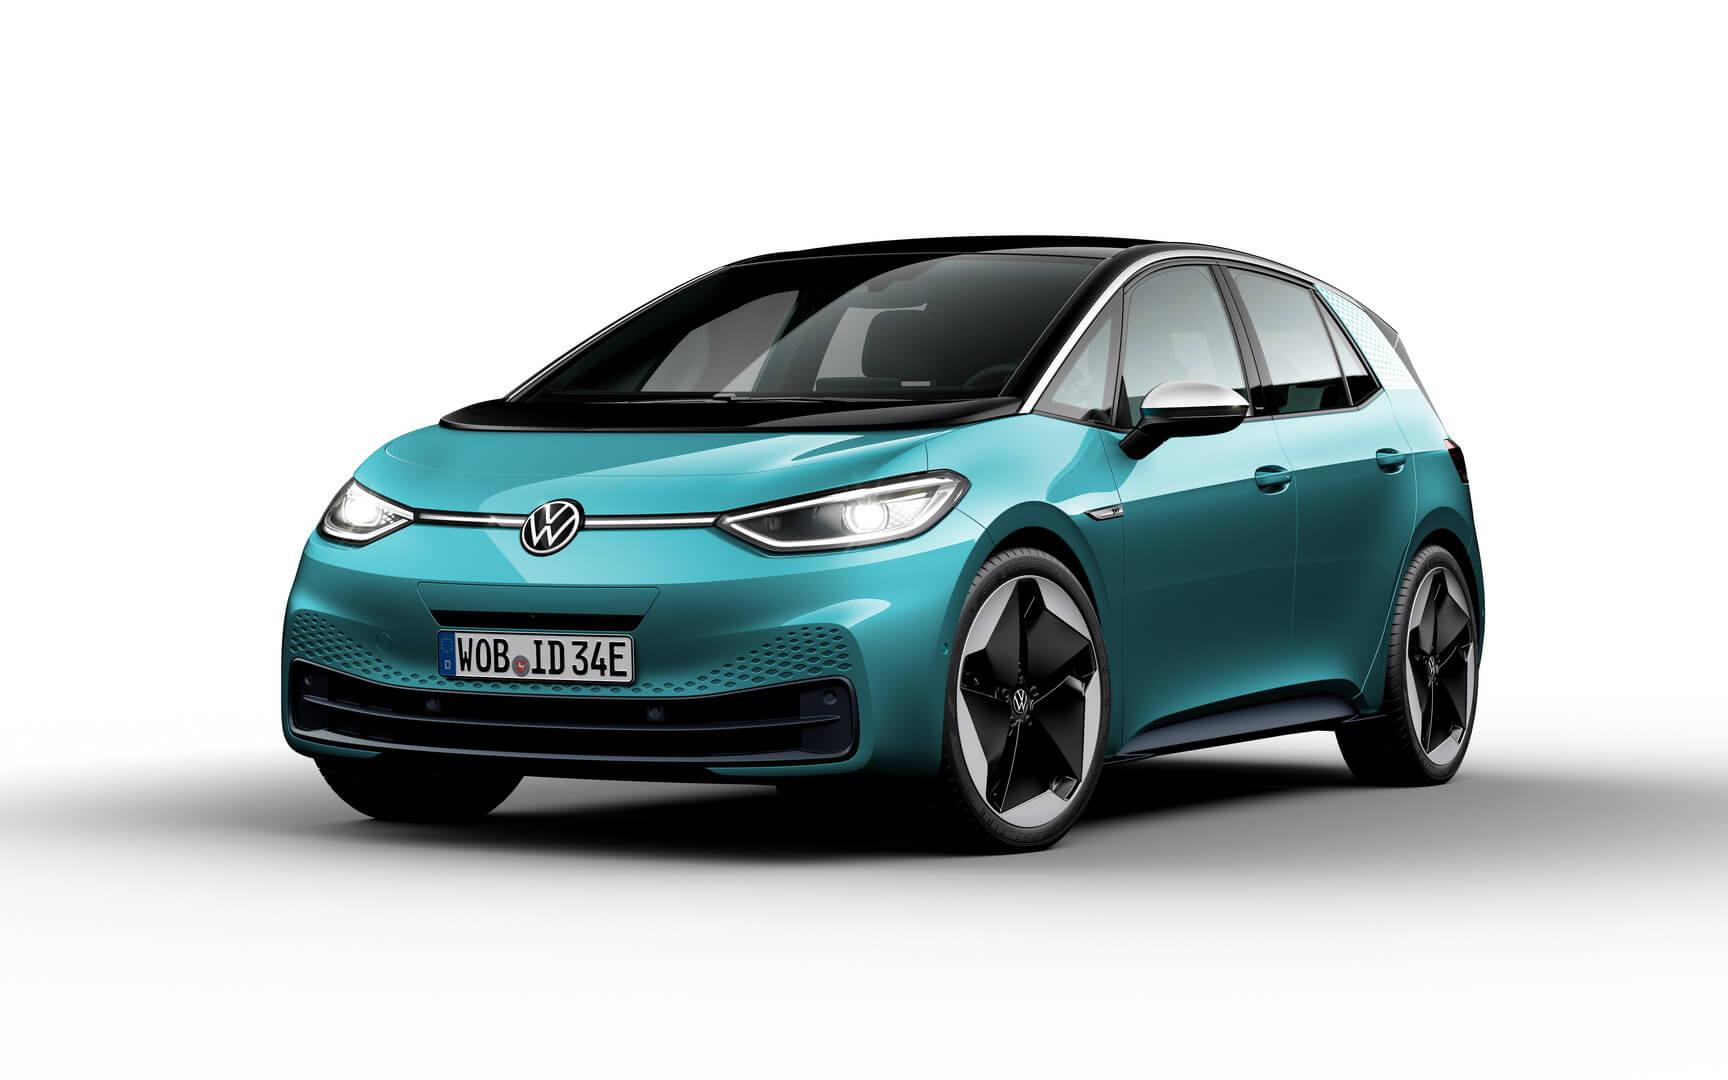 Фотография экоавто Volkswagen ID.3 1ST (Mid-Range) - фото 19